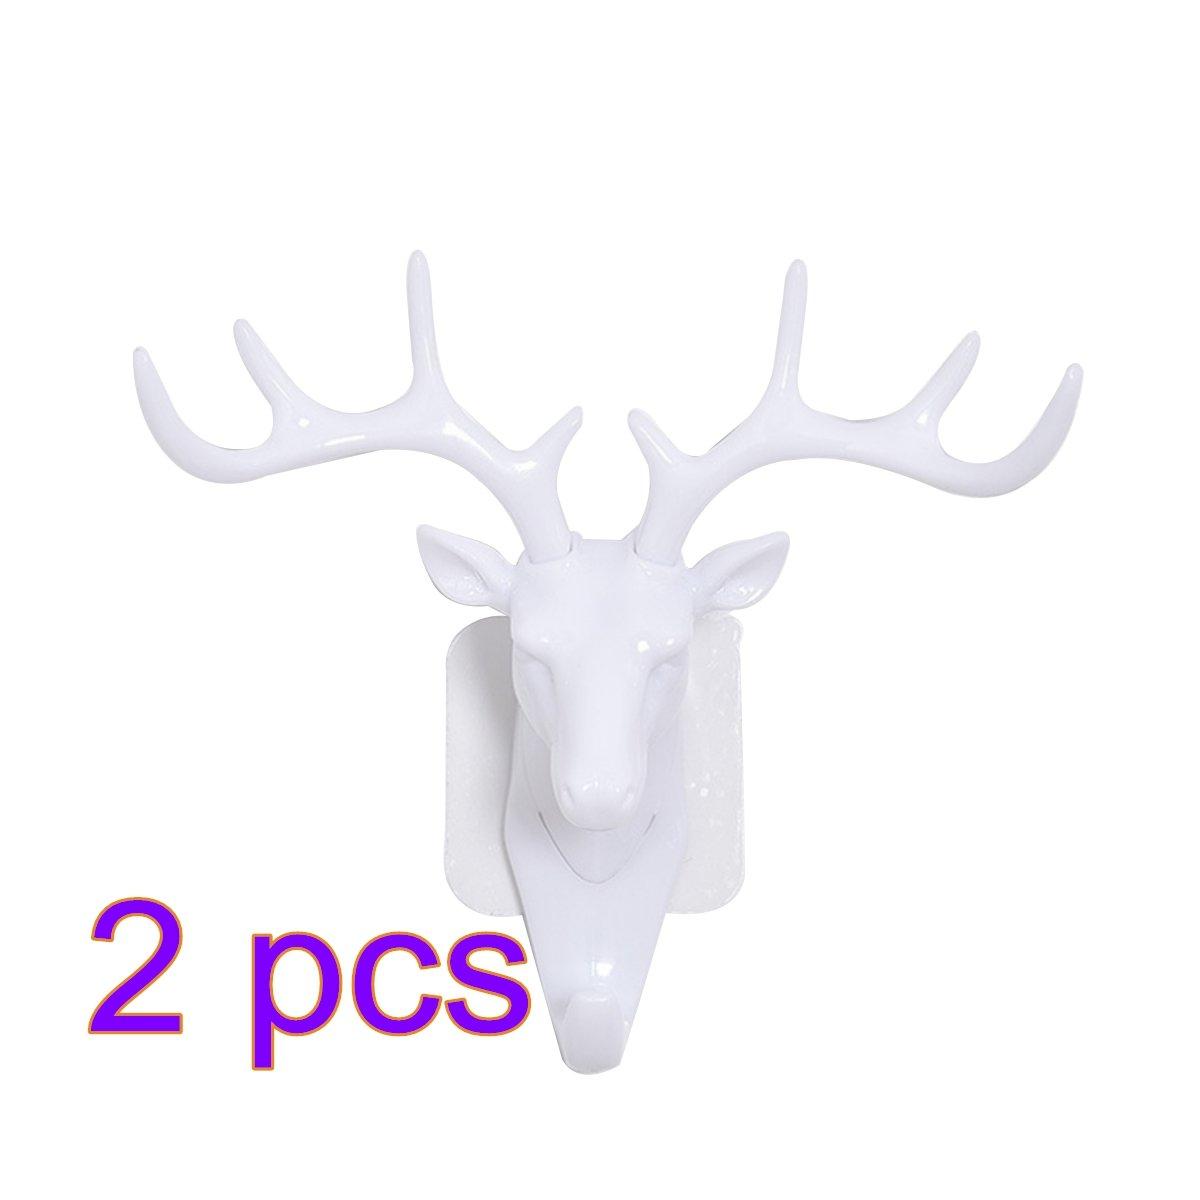 Hmane 2 Pcs Wall Hanger Creative Deer Head Antlers Shape Wall Hanger Coat Hat Hook Home Decor - (Black)